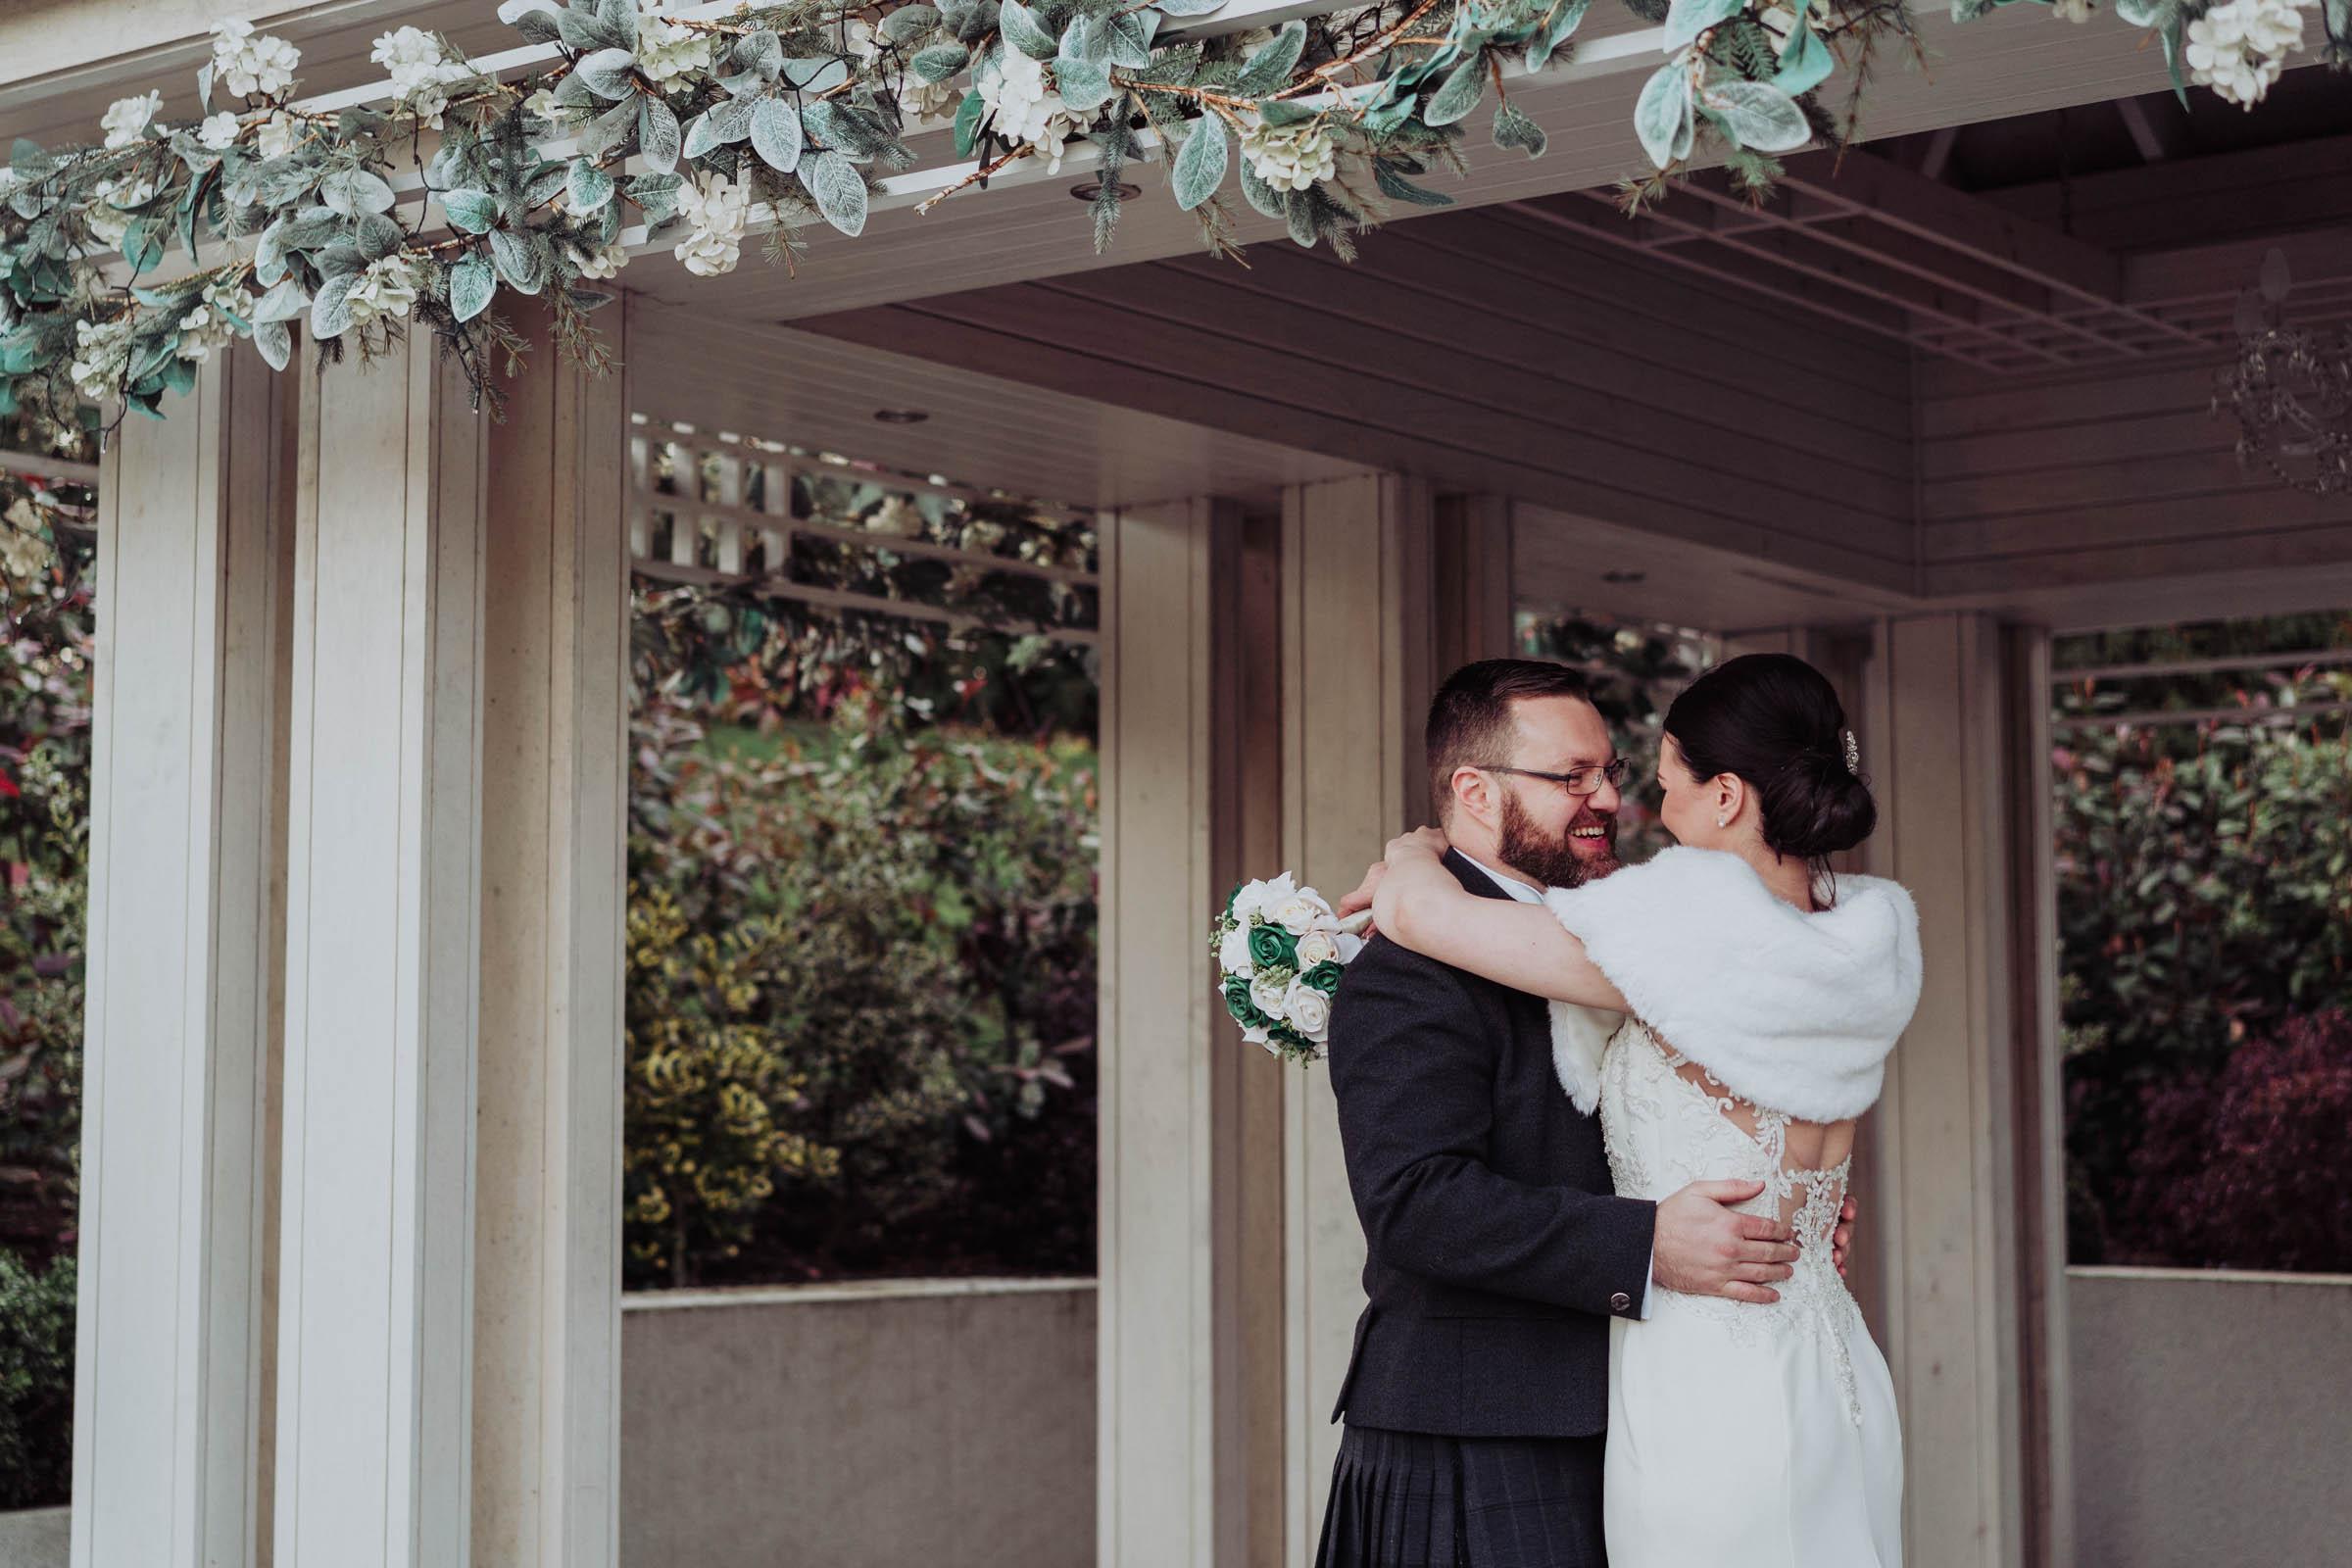 Radstone-Wedding-Dearly-Photography-Scotland (32 of 50).jpg